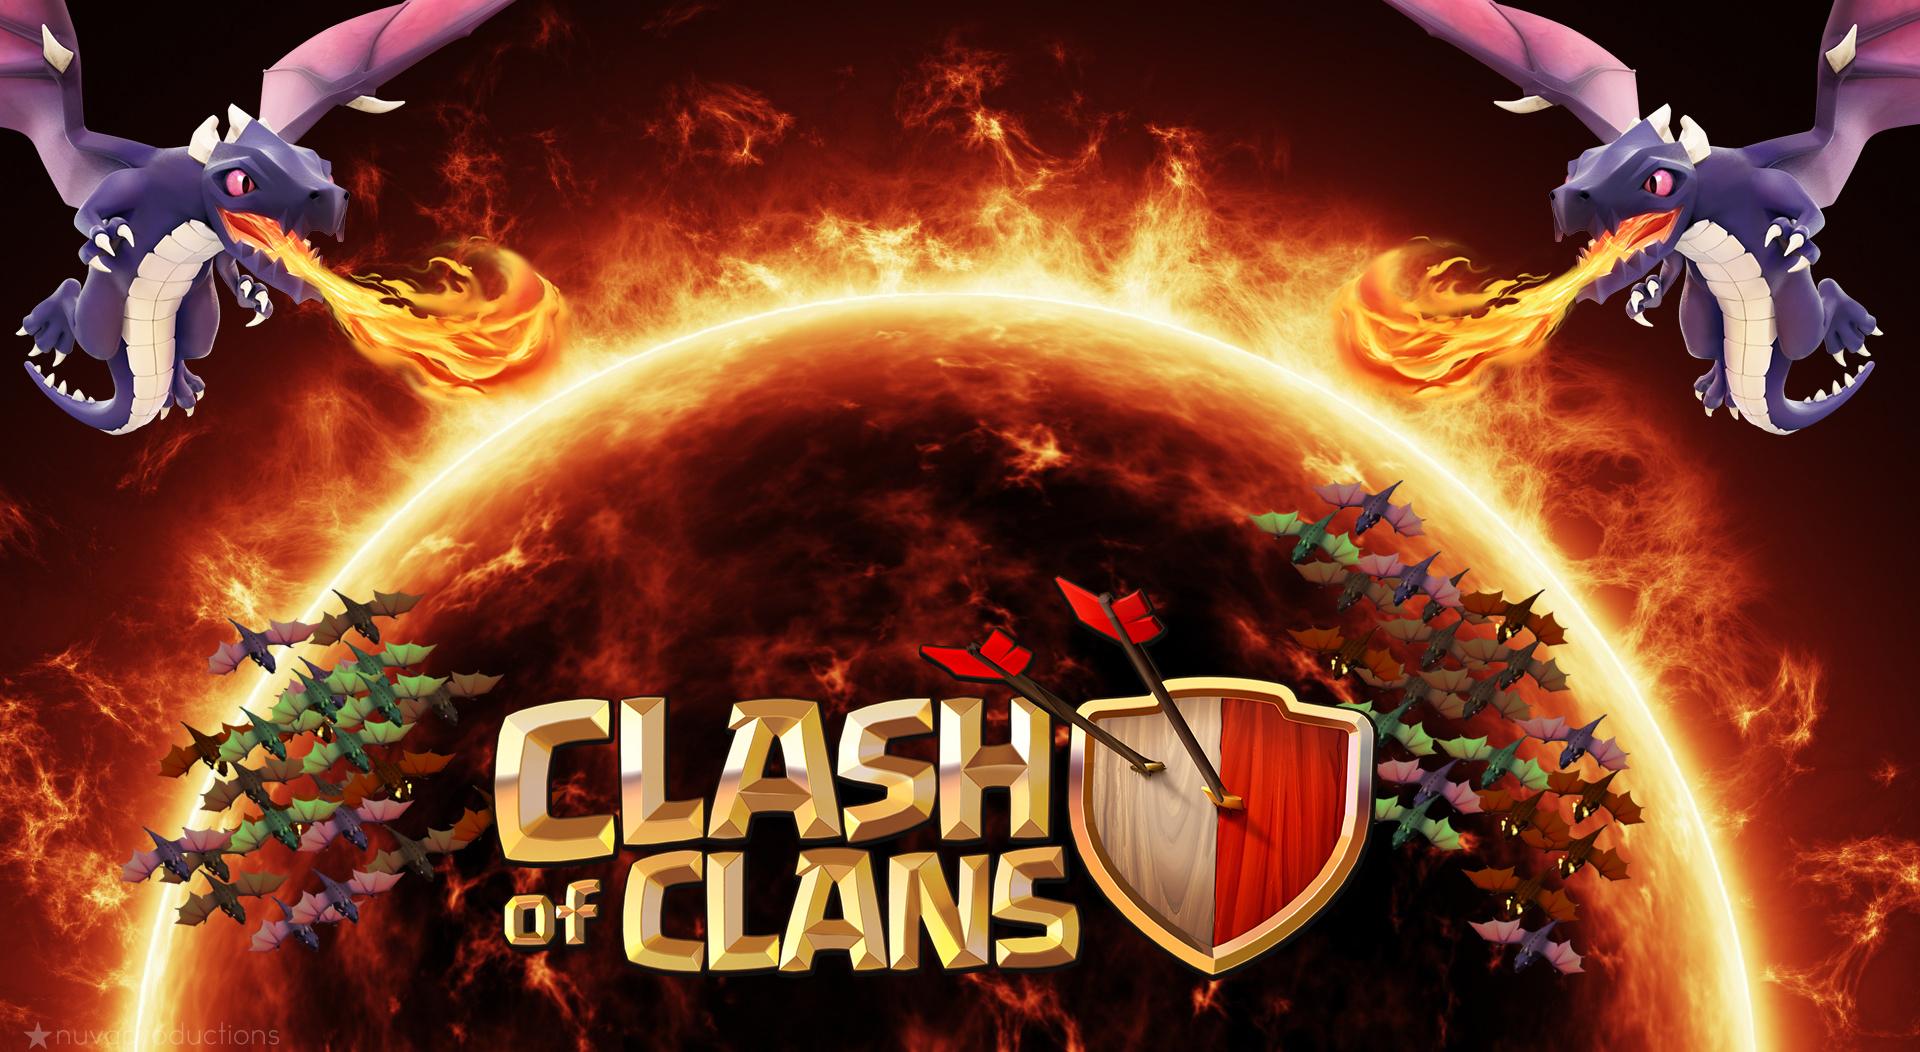 Clash Of Clans Wallpapers WeNeedFun 1920x1052